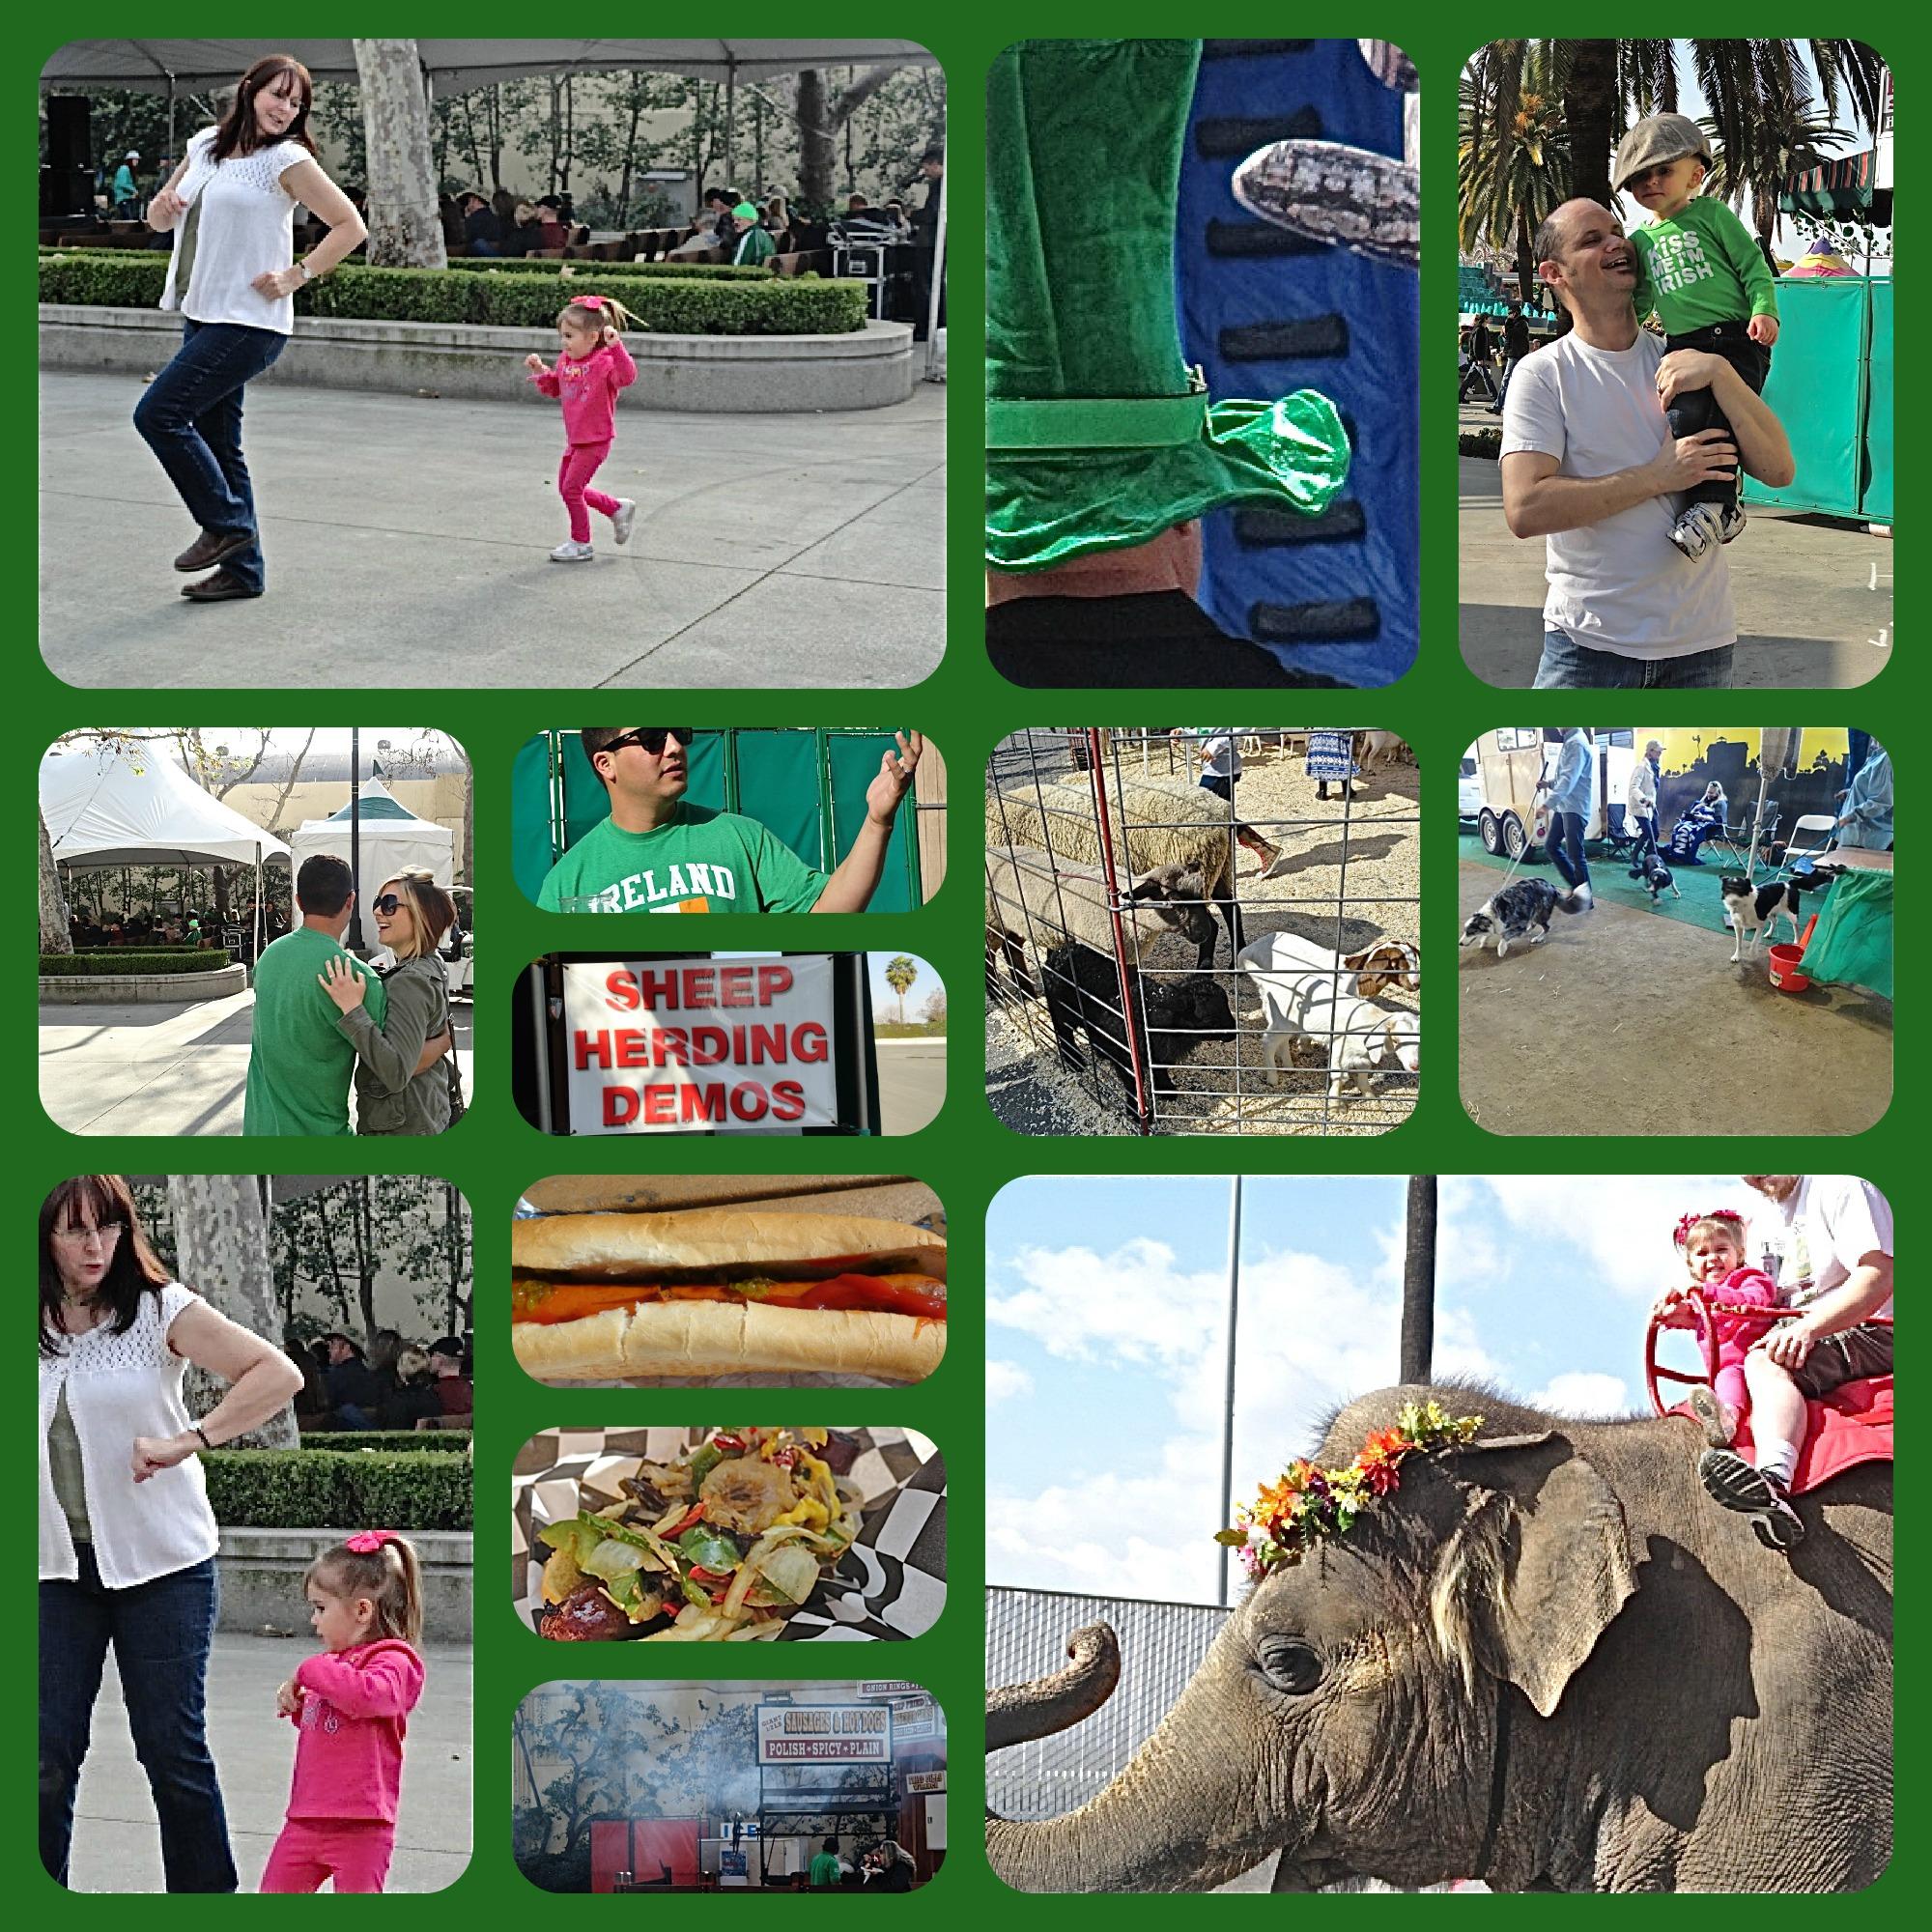 St. Patrick's Day, Irish Festival, L.A. County Fairgrounds, elephants, petting zoo, dancing, Lynn Kelley, Lynn Kelley author, http://lynnkelleyauthor.wordpress.com